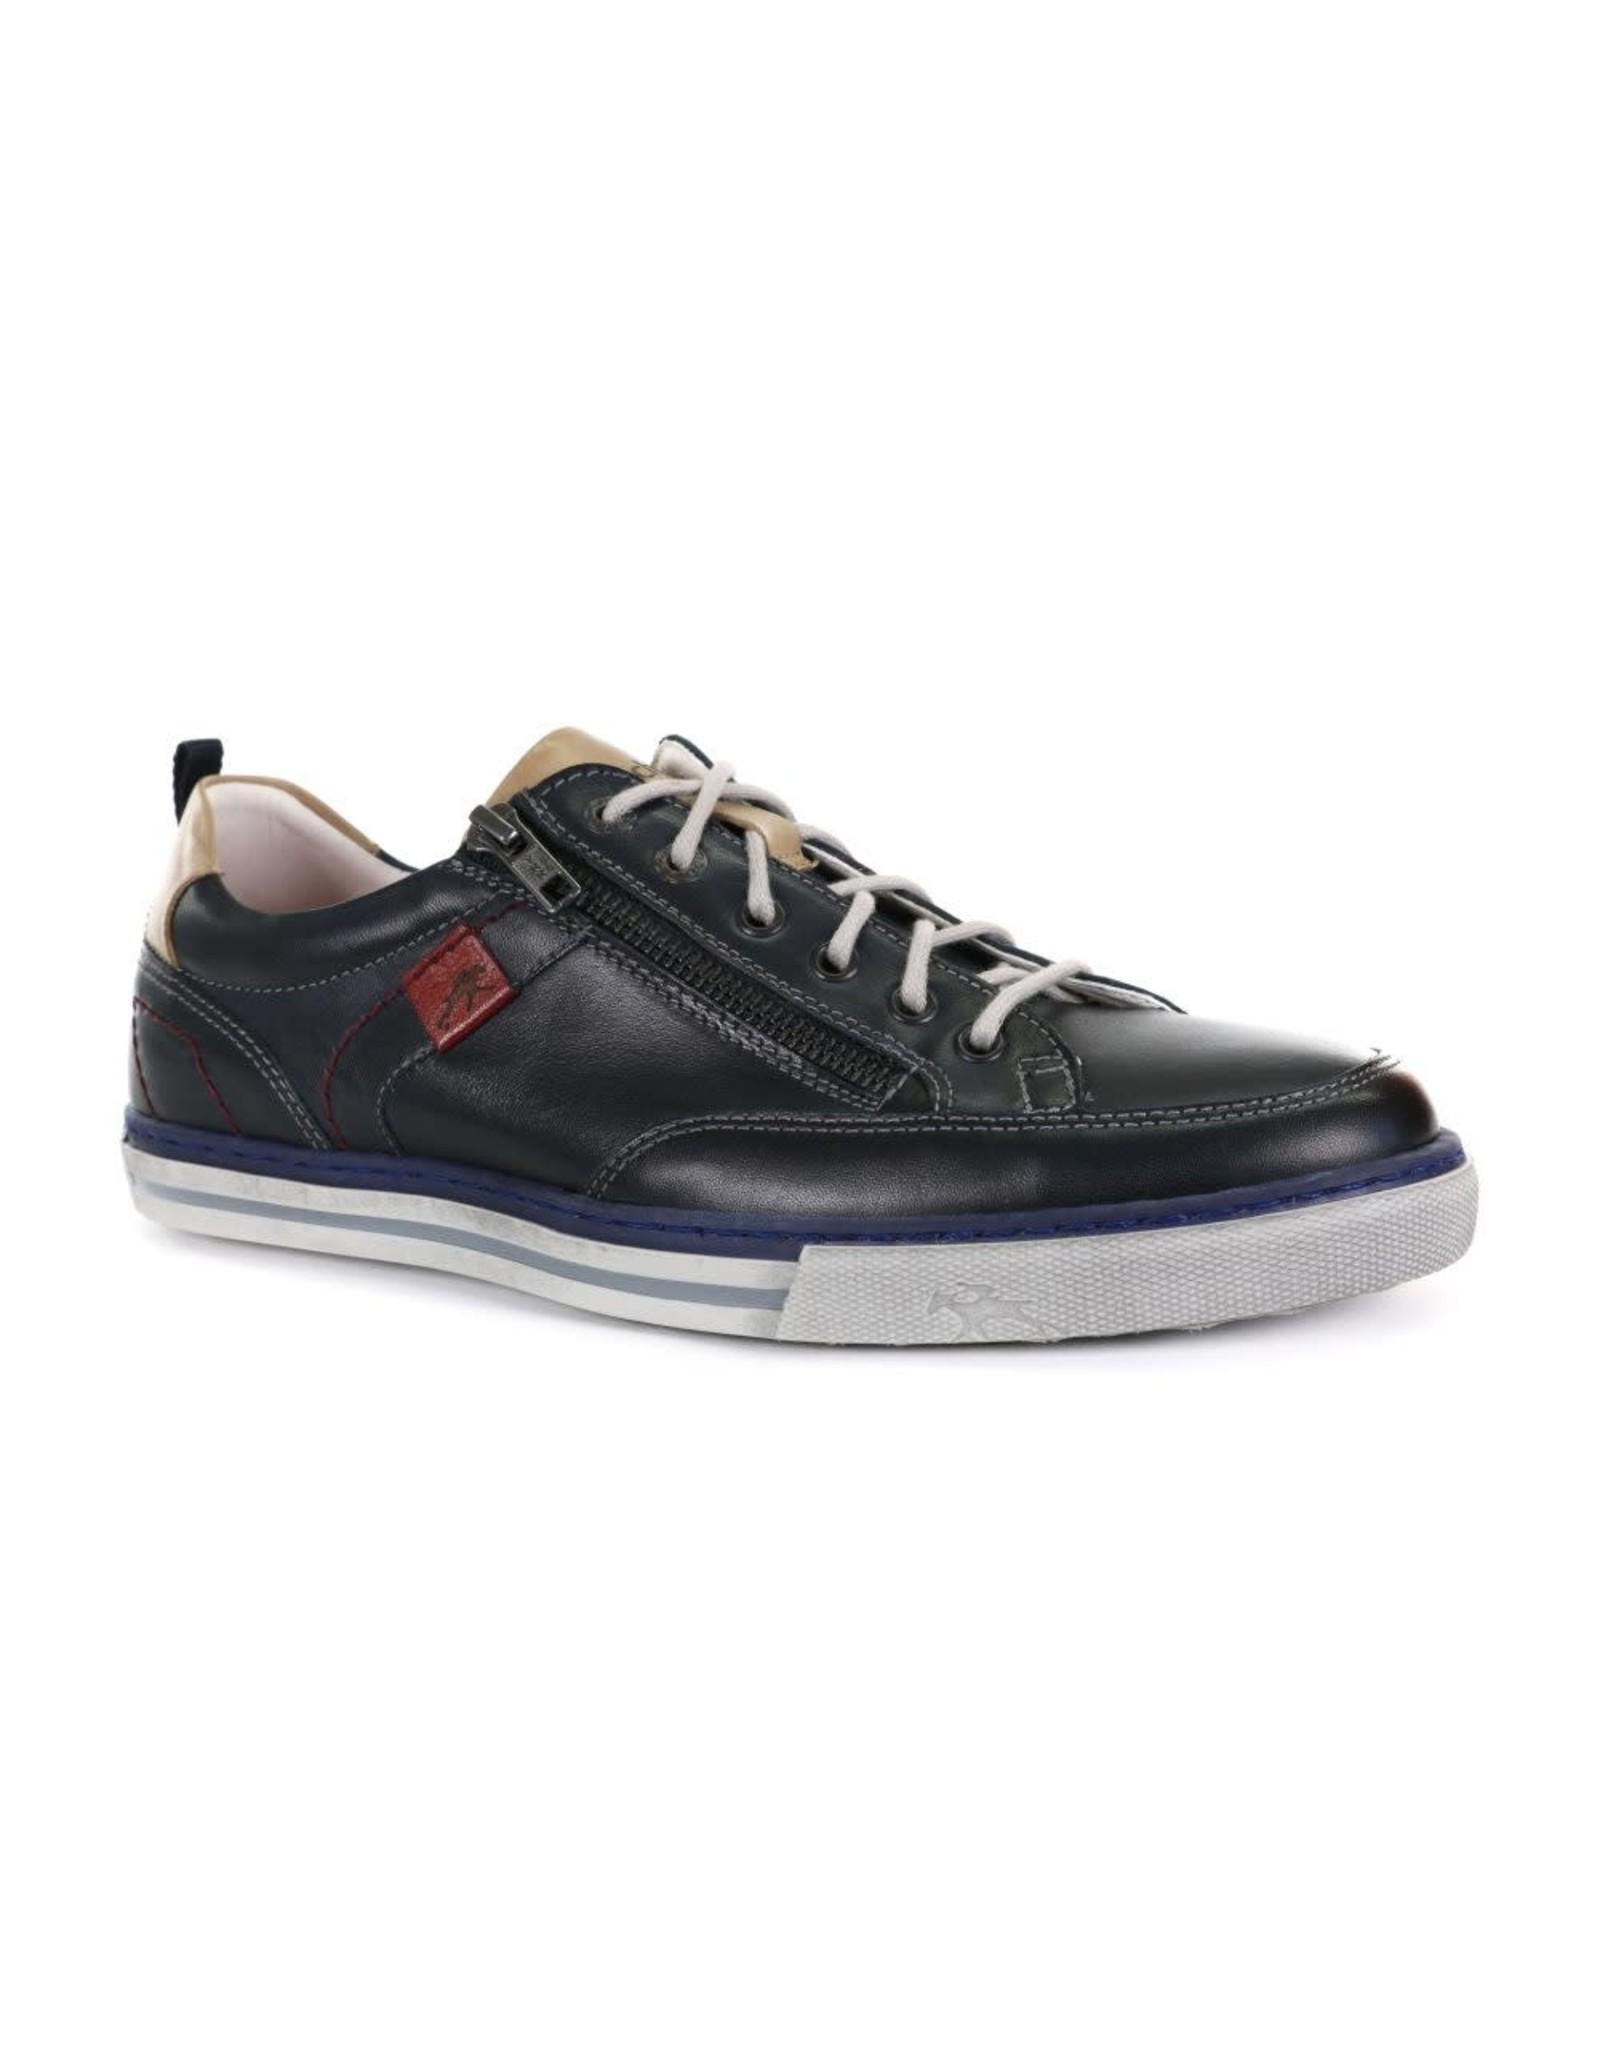 Fluchos 21949 9376 Fluchos Sneaker